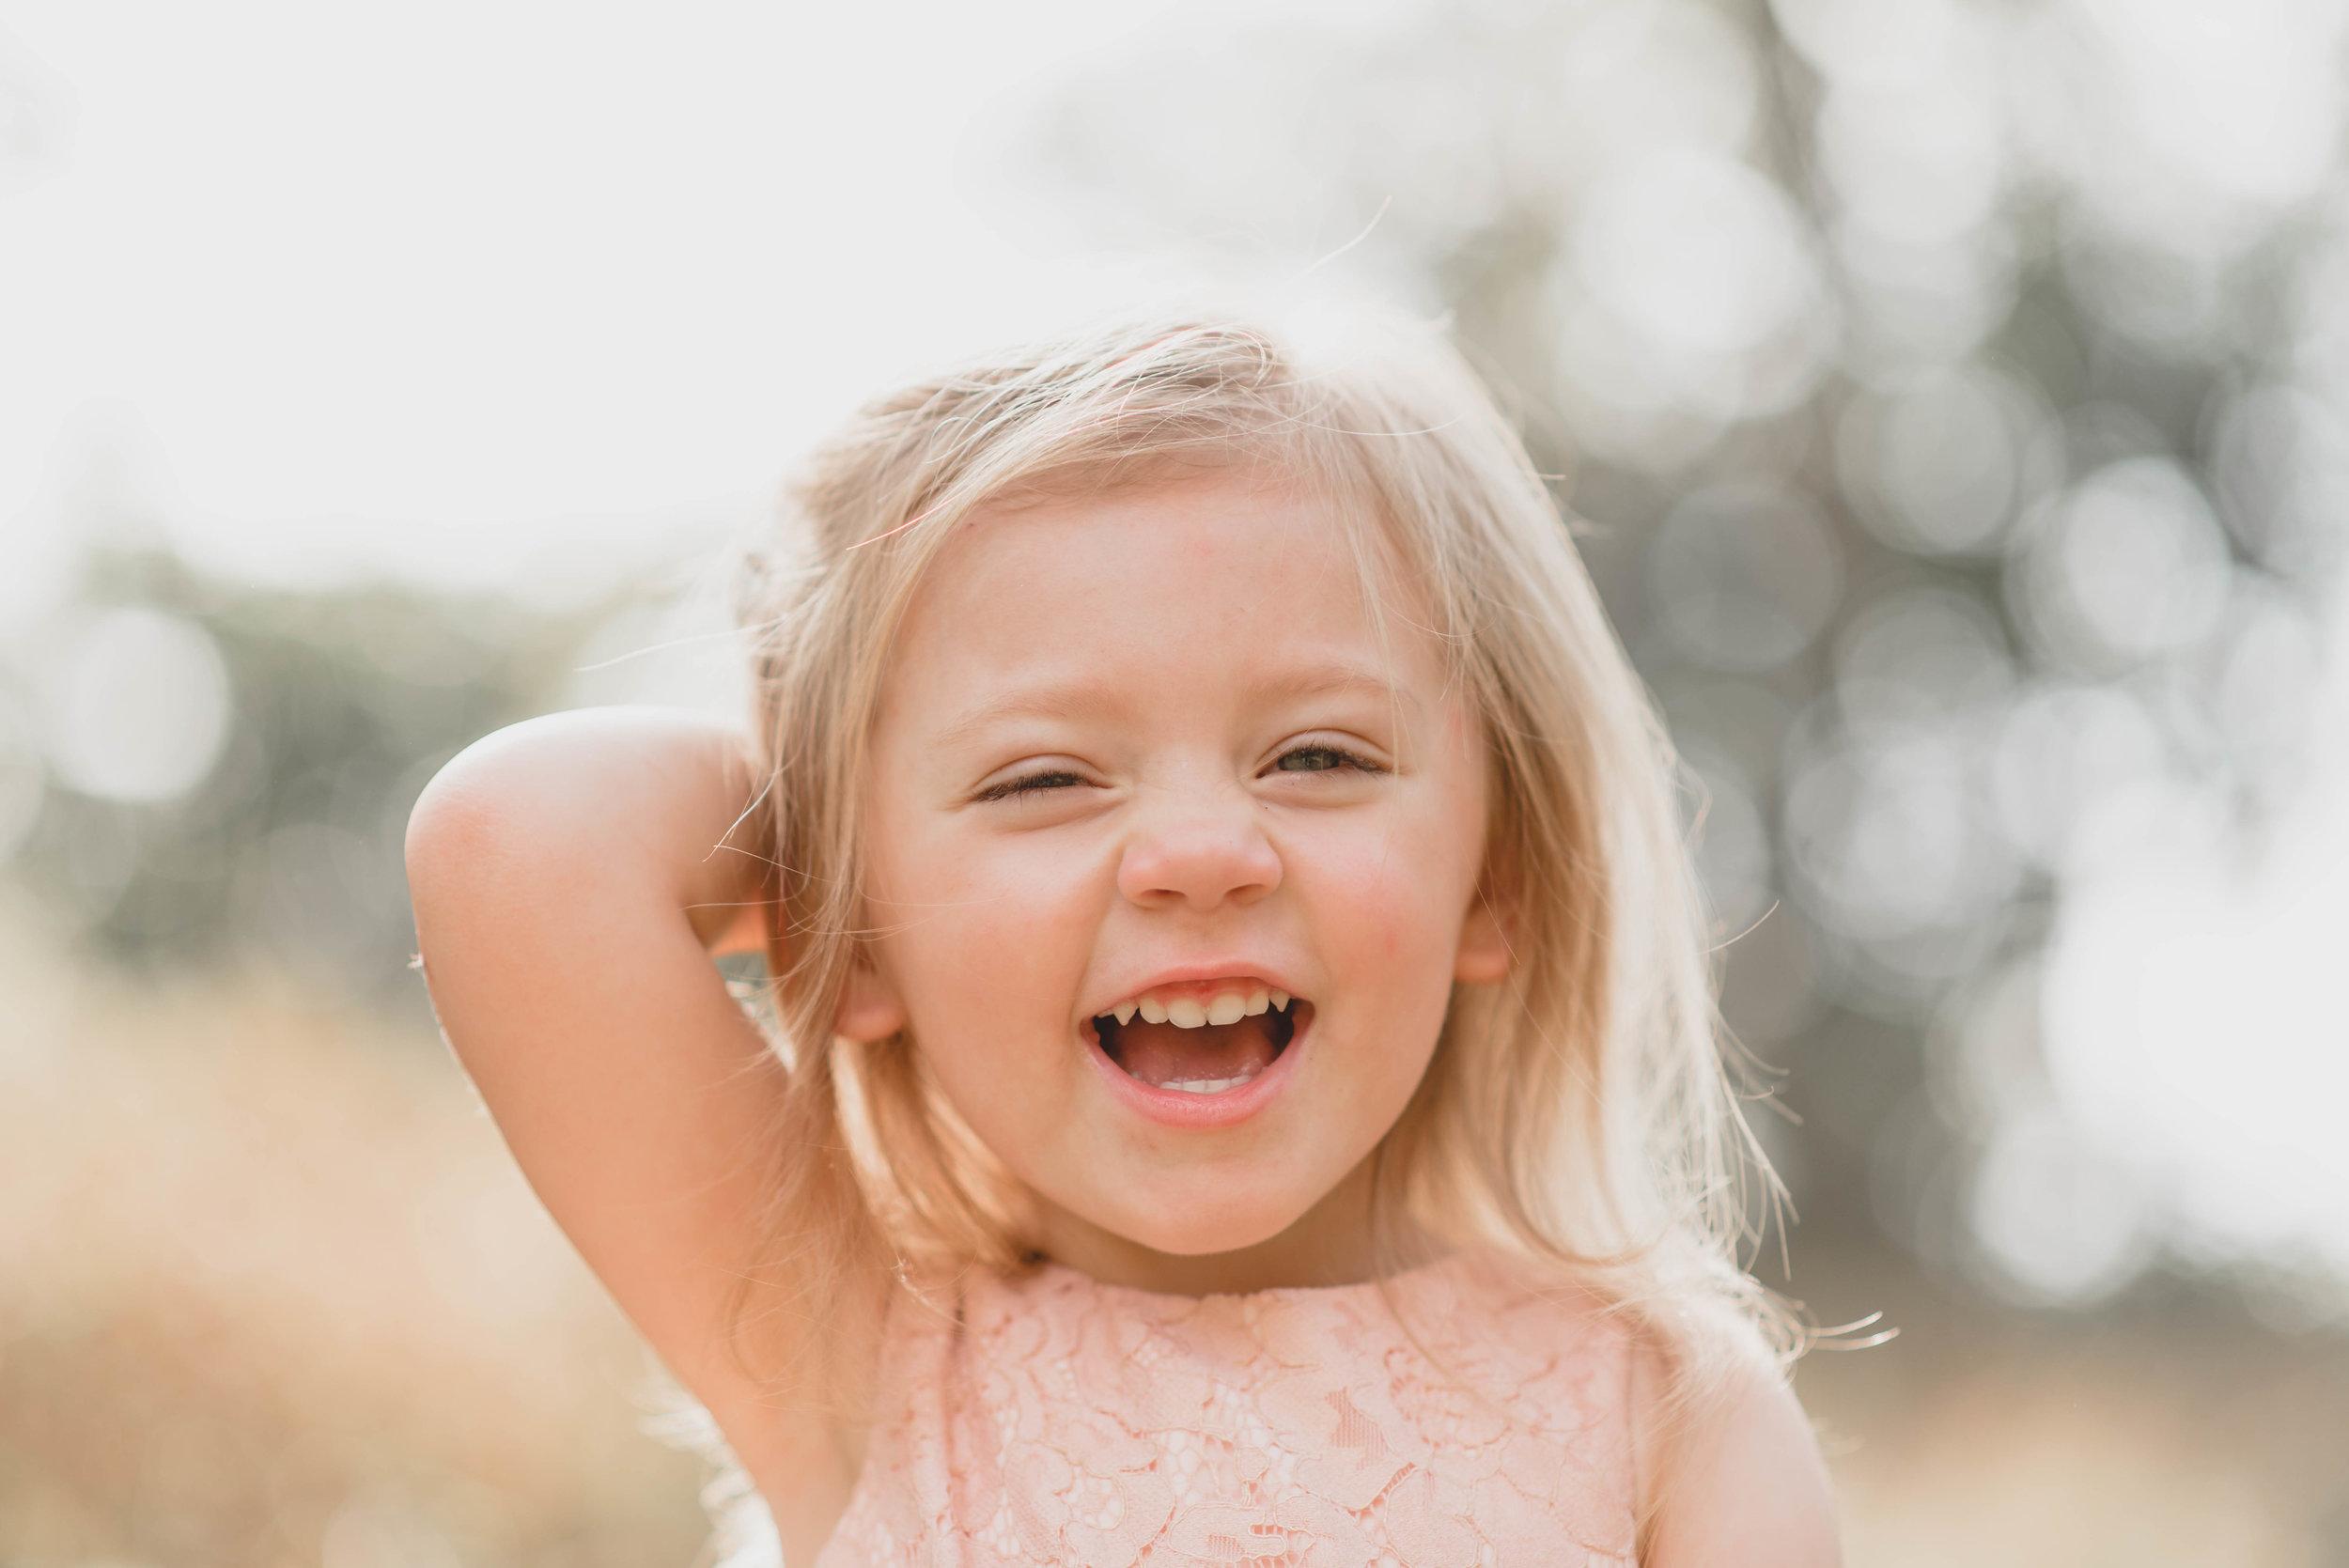 christi-stoner-photography-child-portrait